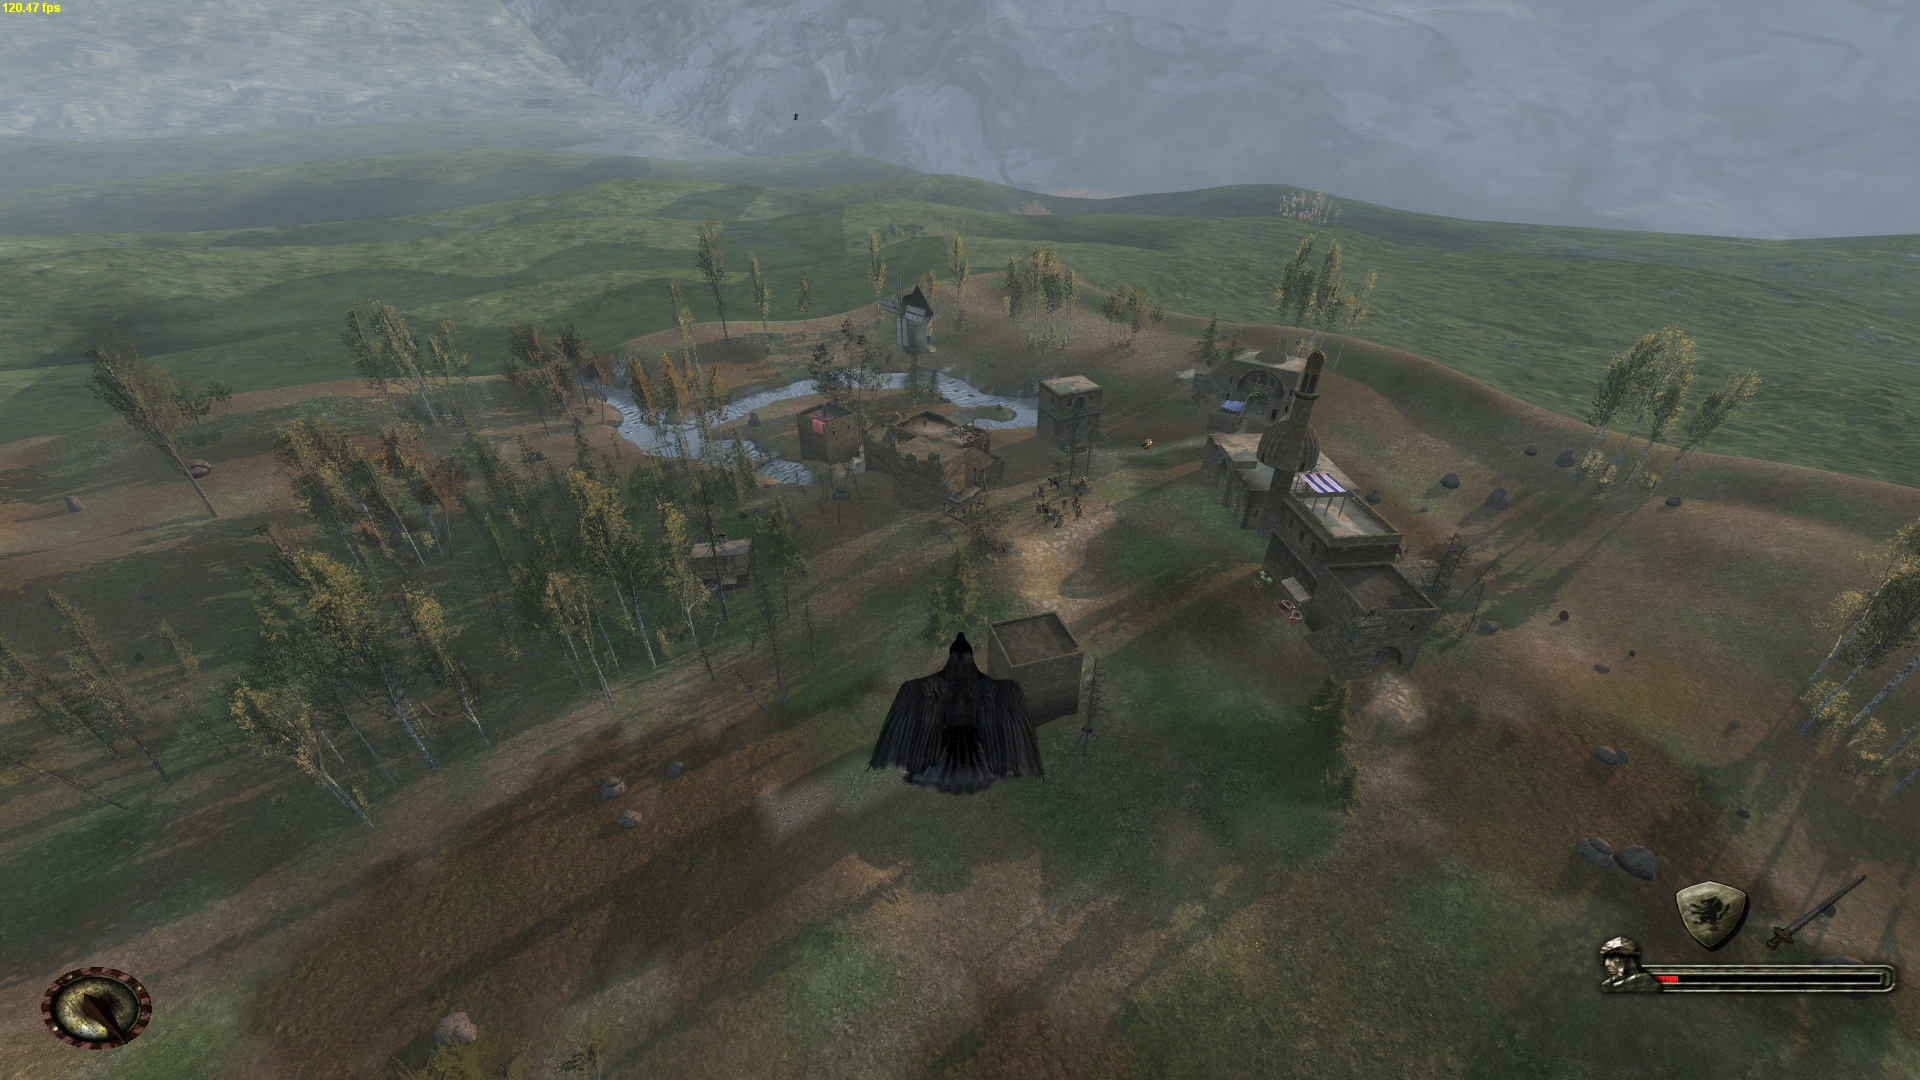 Raven hovering over merchant villas